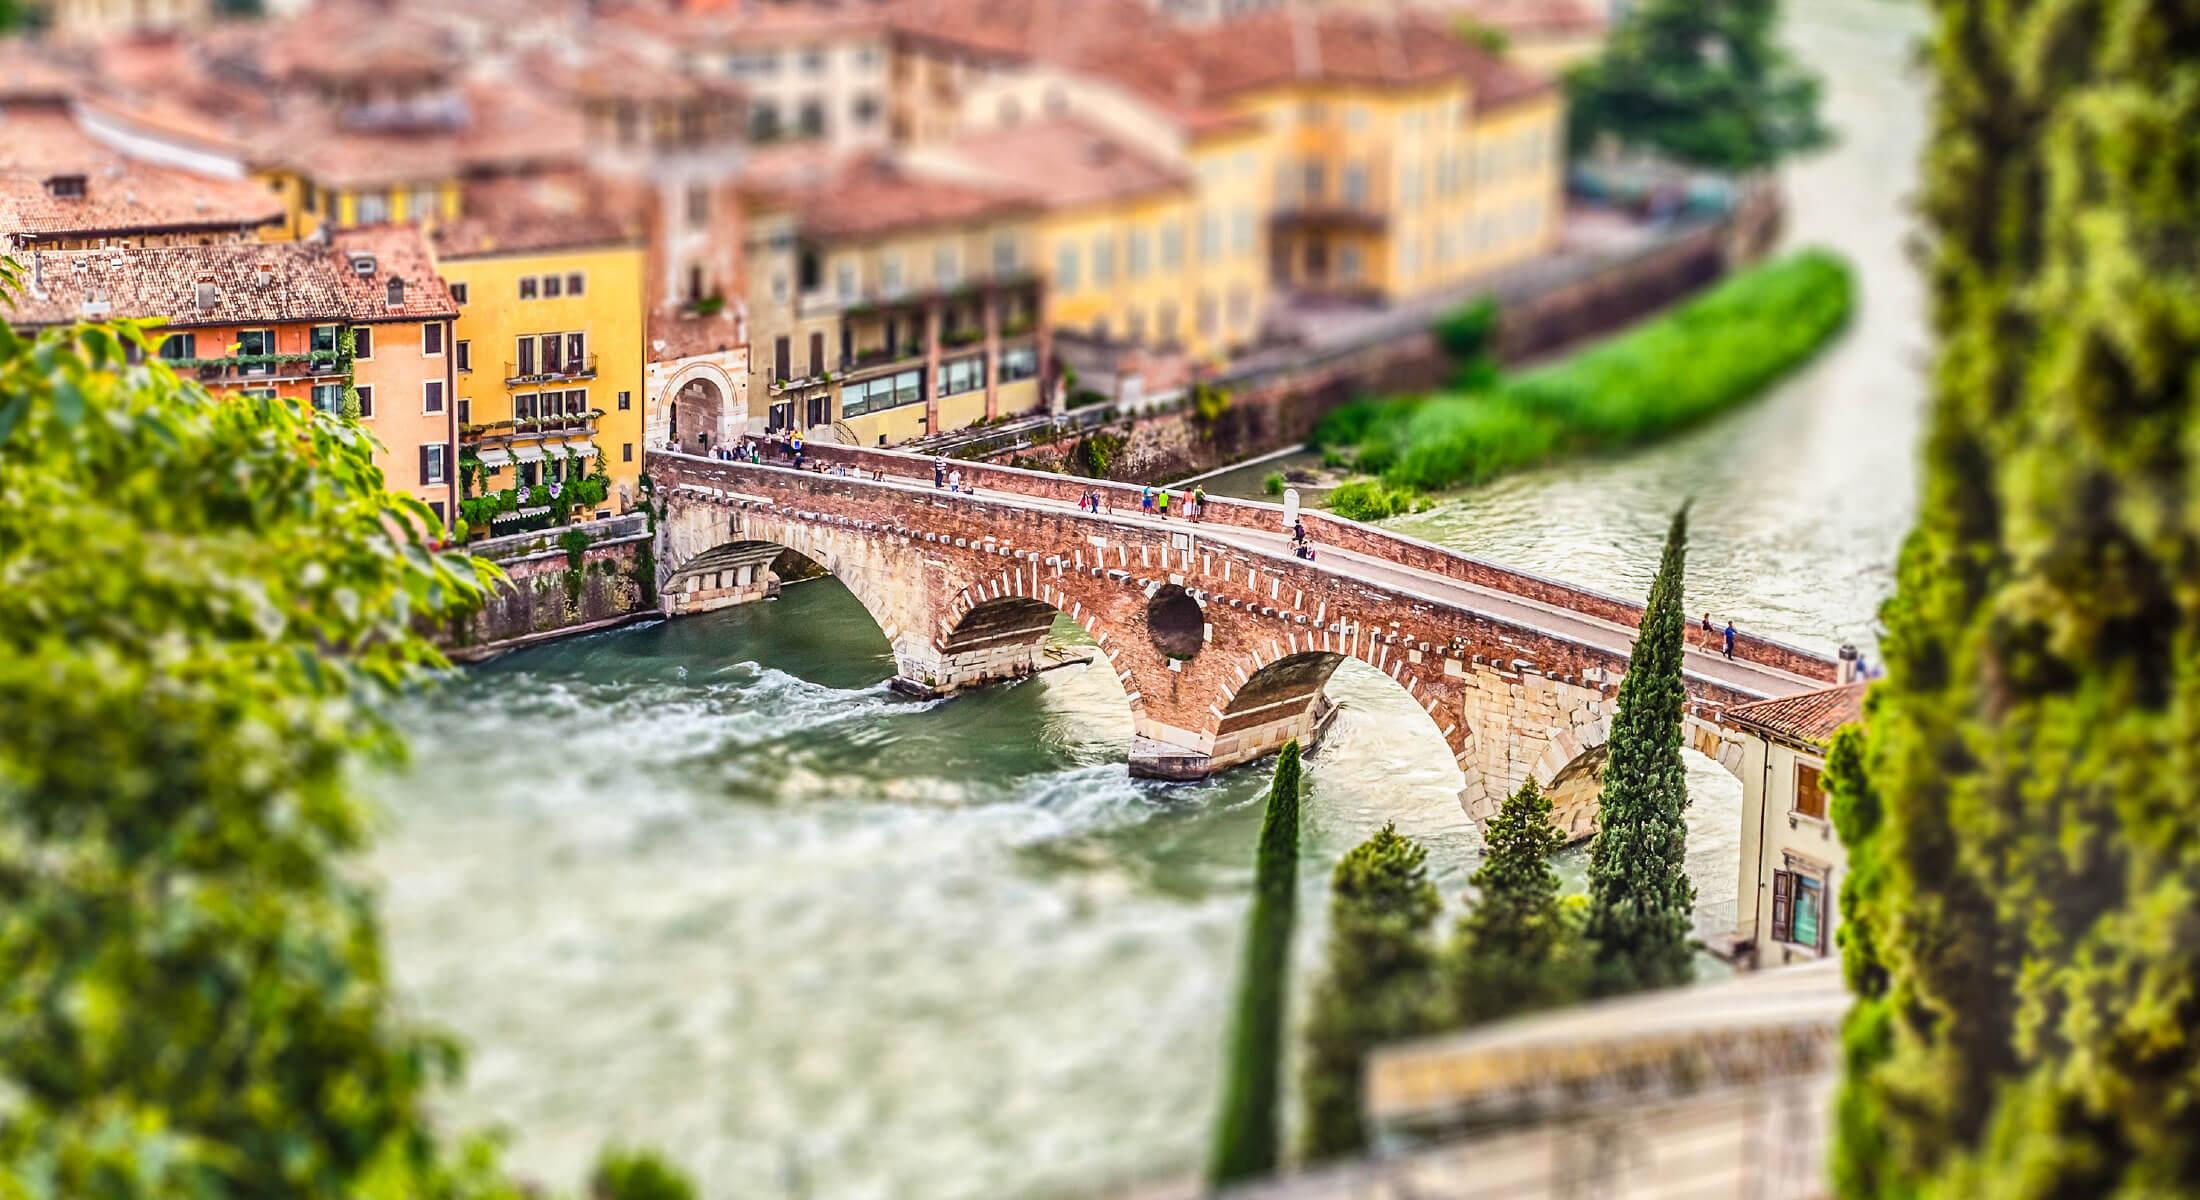 People crossing a bridge in an old European city